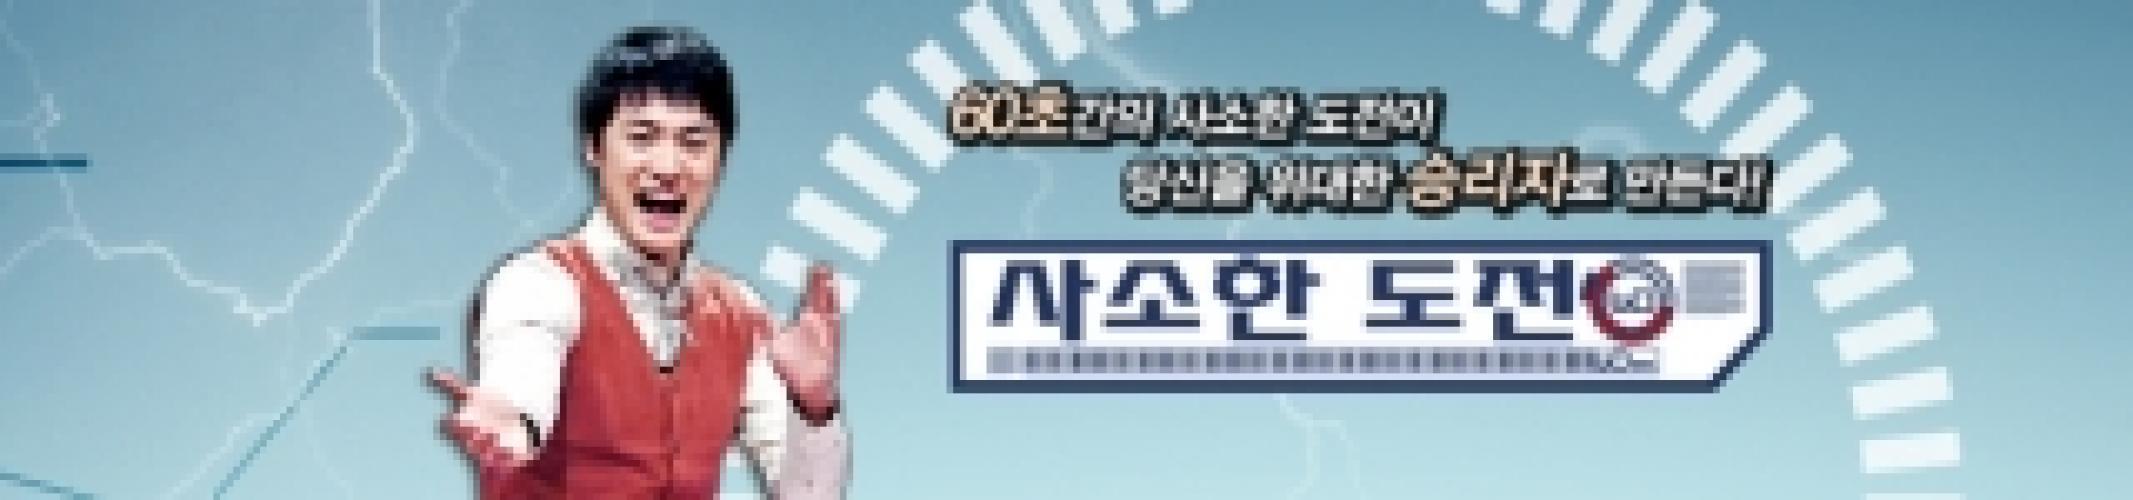 Sasohan Dojeon 60-cho next episode air date poster